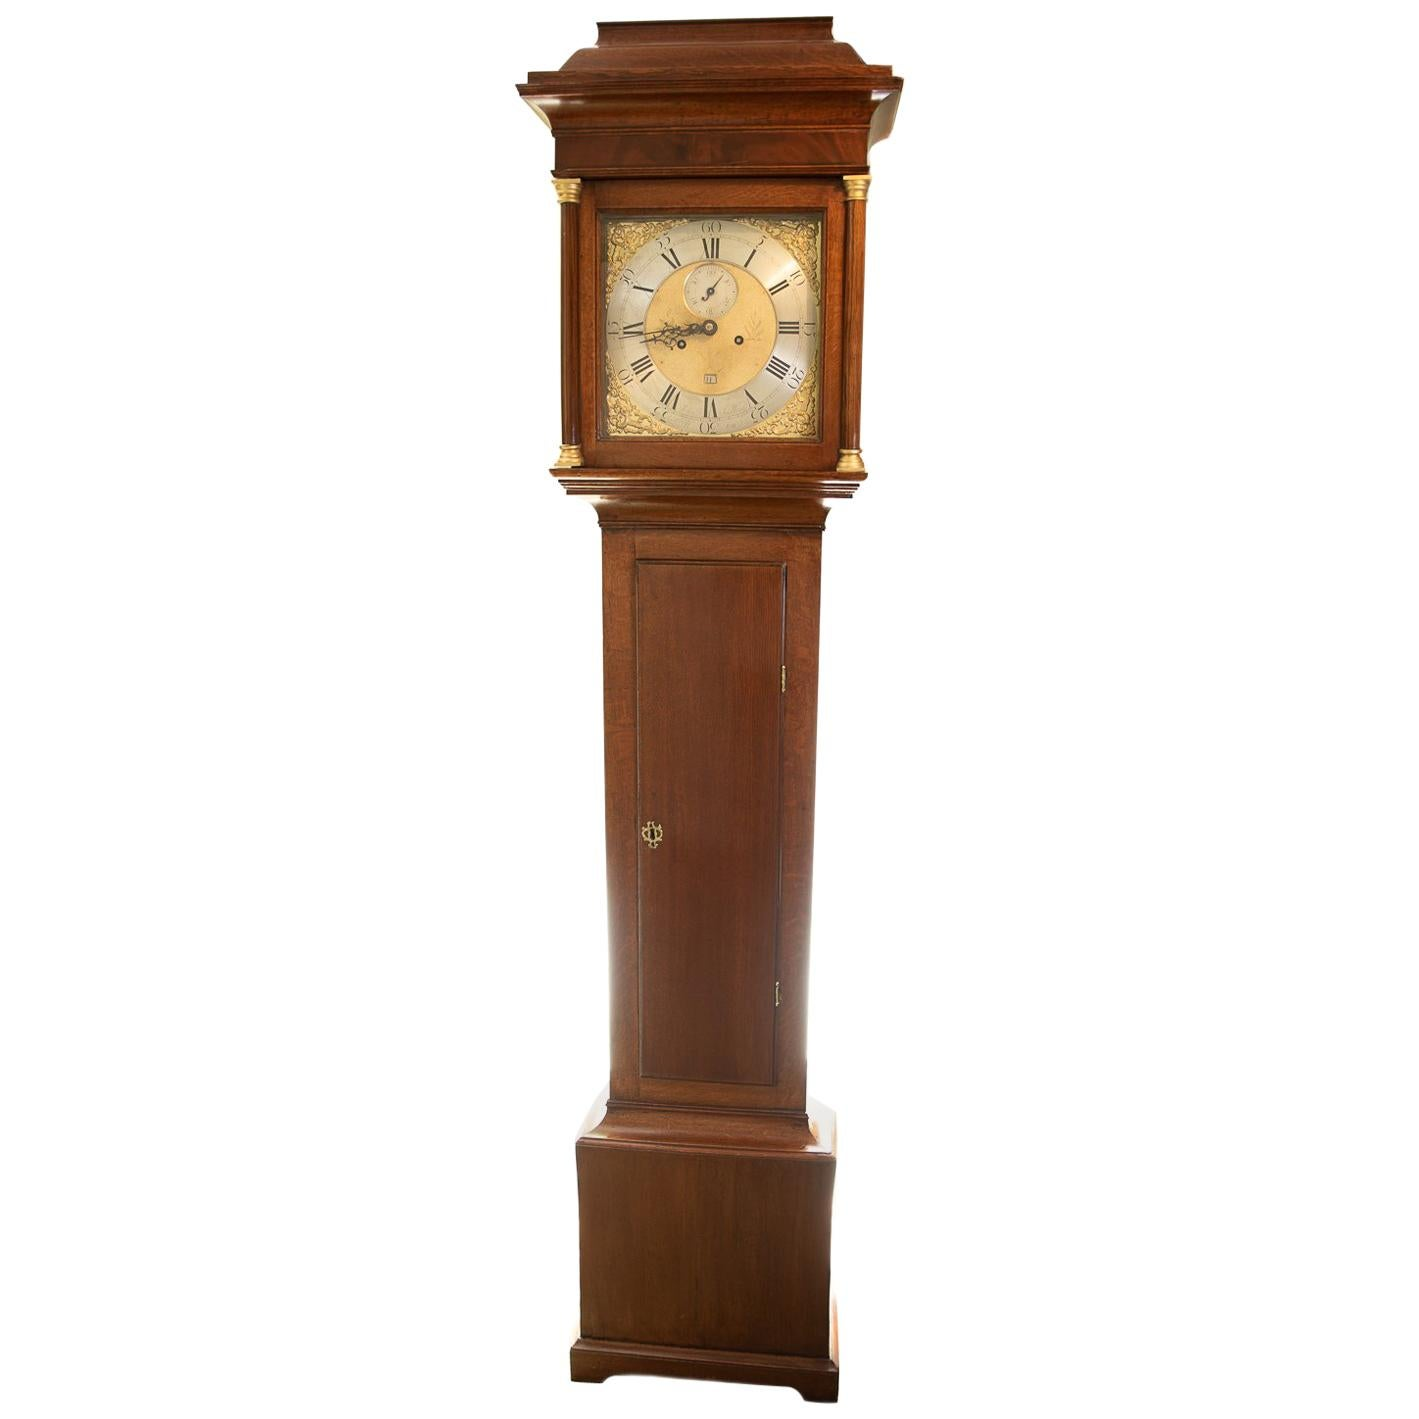 18th Century John Snelling 8 Day Square Brass Dial Longcase Clock